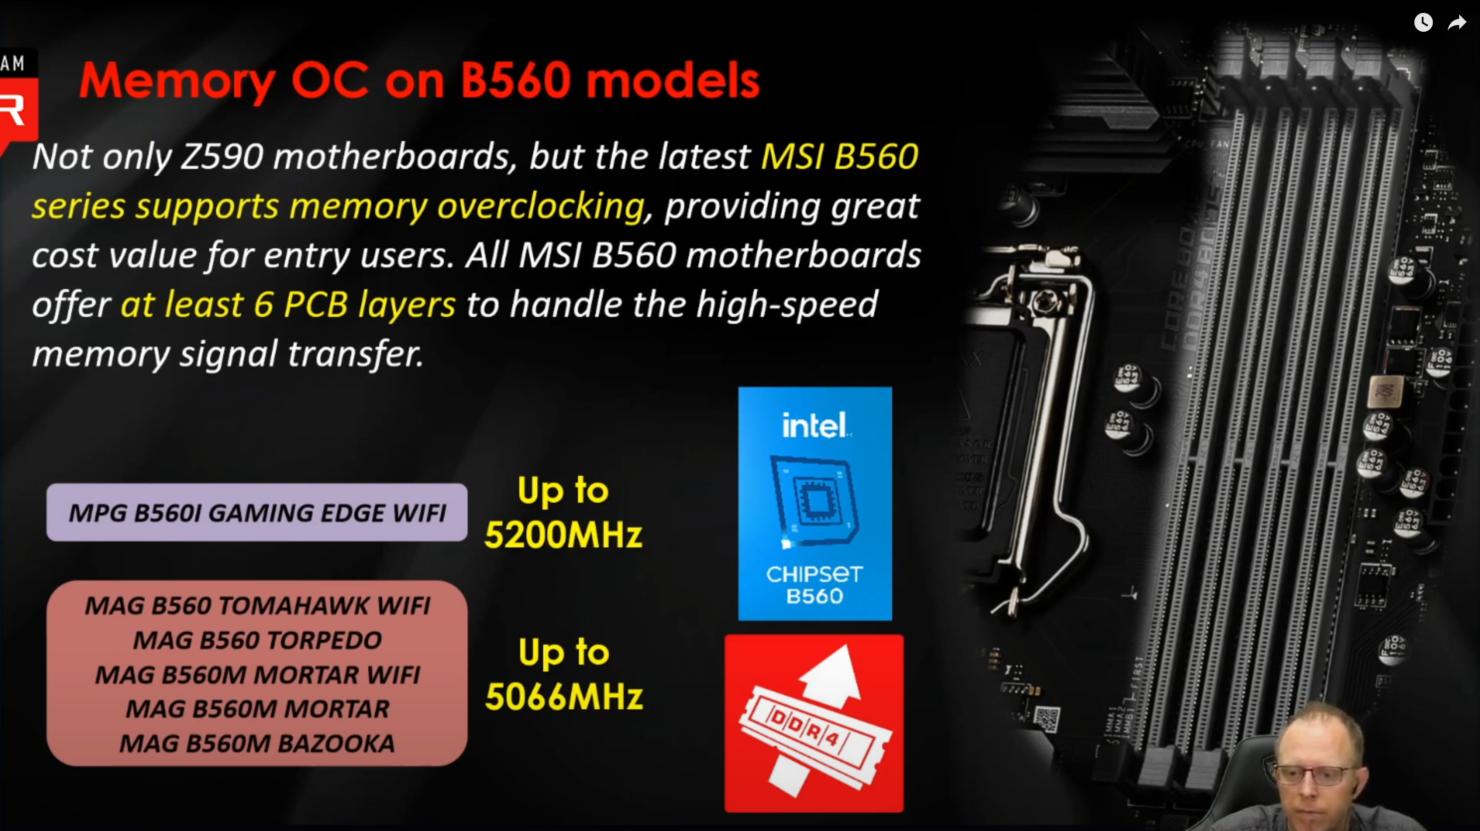 msi-intel-11th-gen-rocket-lake-desktop-cpu-overclocking-power-limits-temperatures-adaptive-boost-technology-gear-modes-detailed-_14